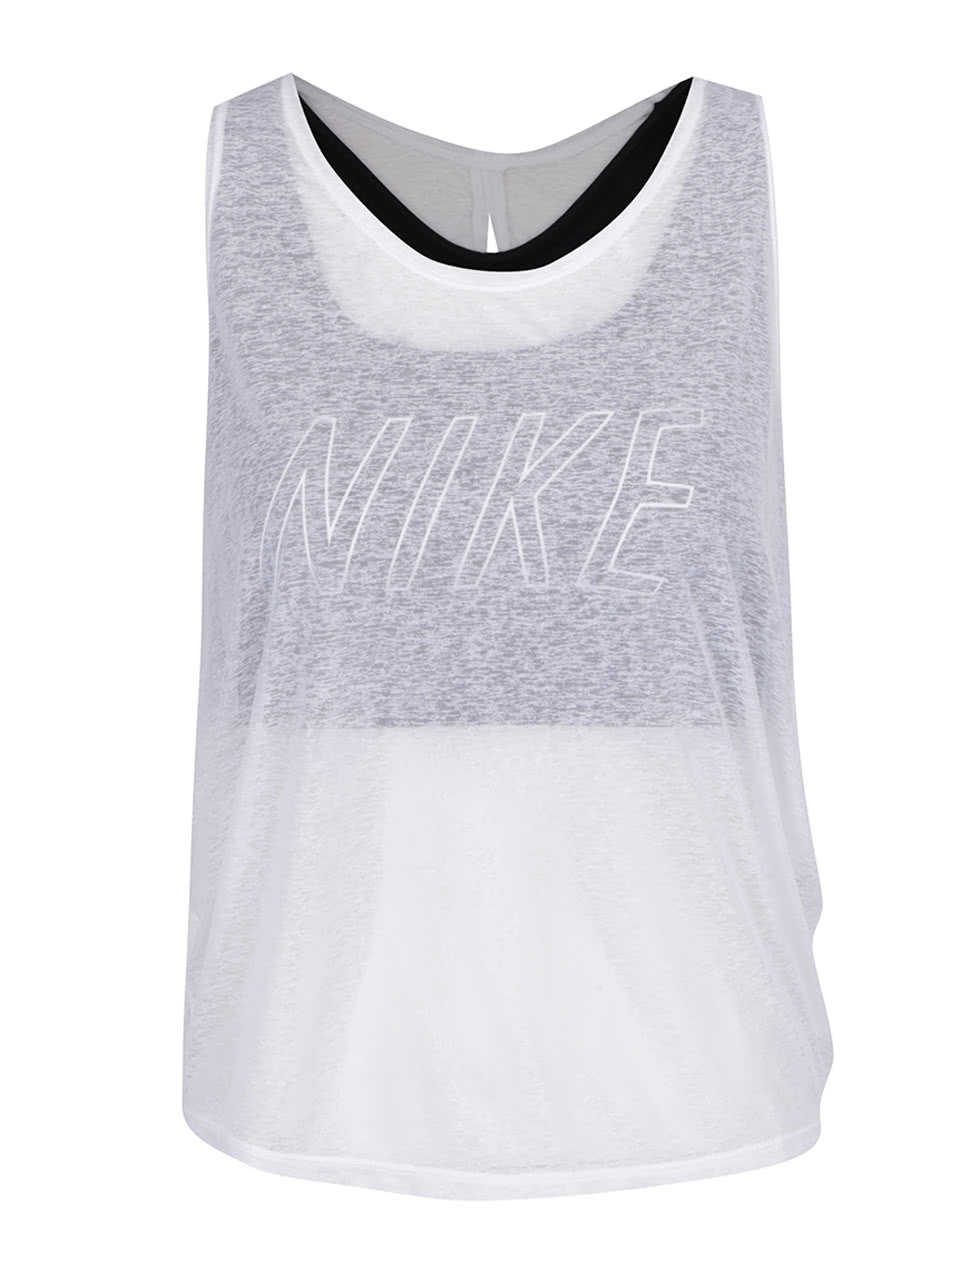 3996ac77c0fc Biele dámske funkčné tielko 2v1 Nike Training ...